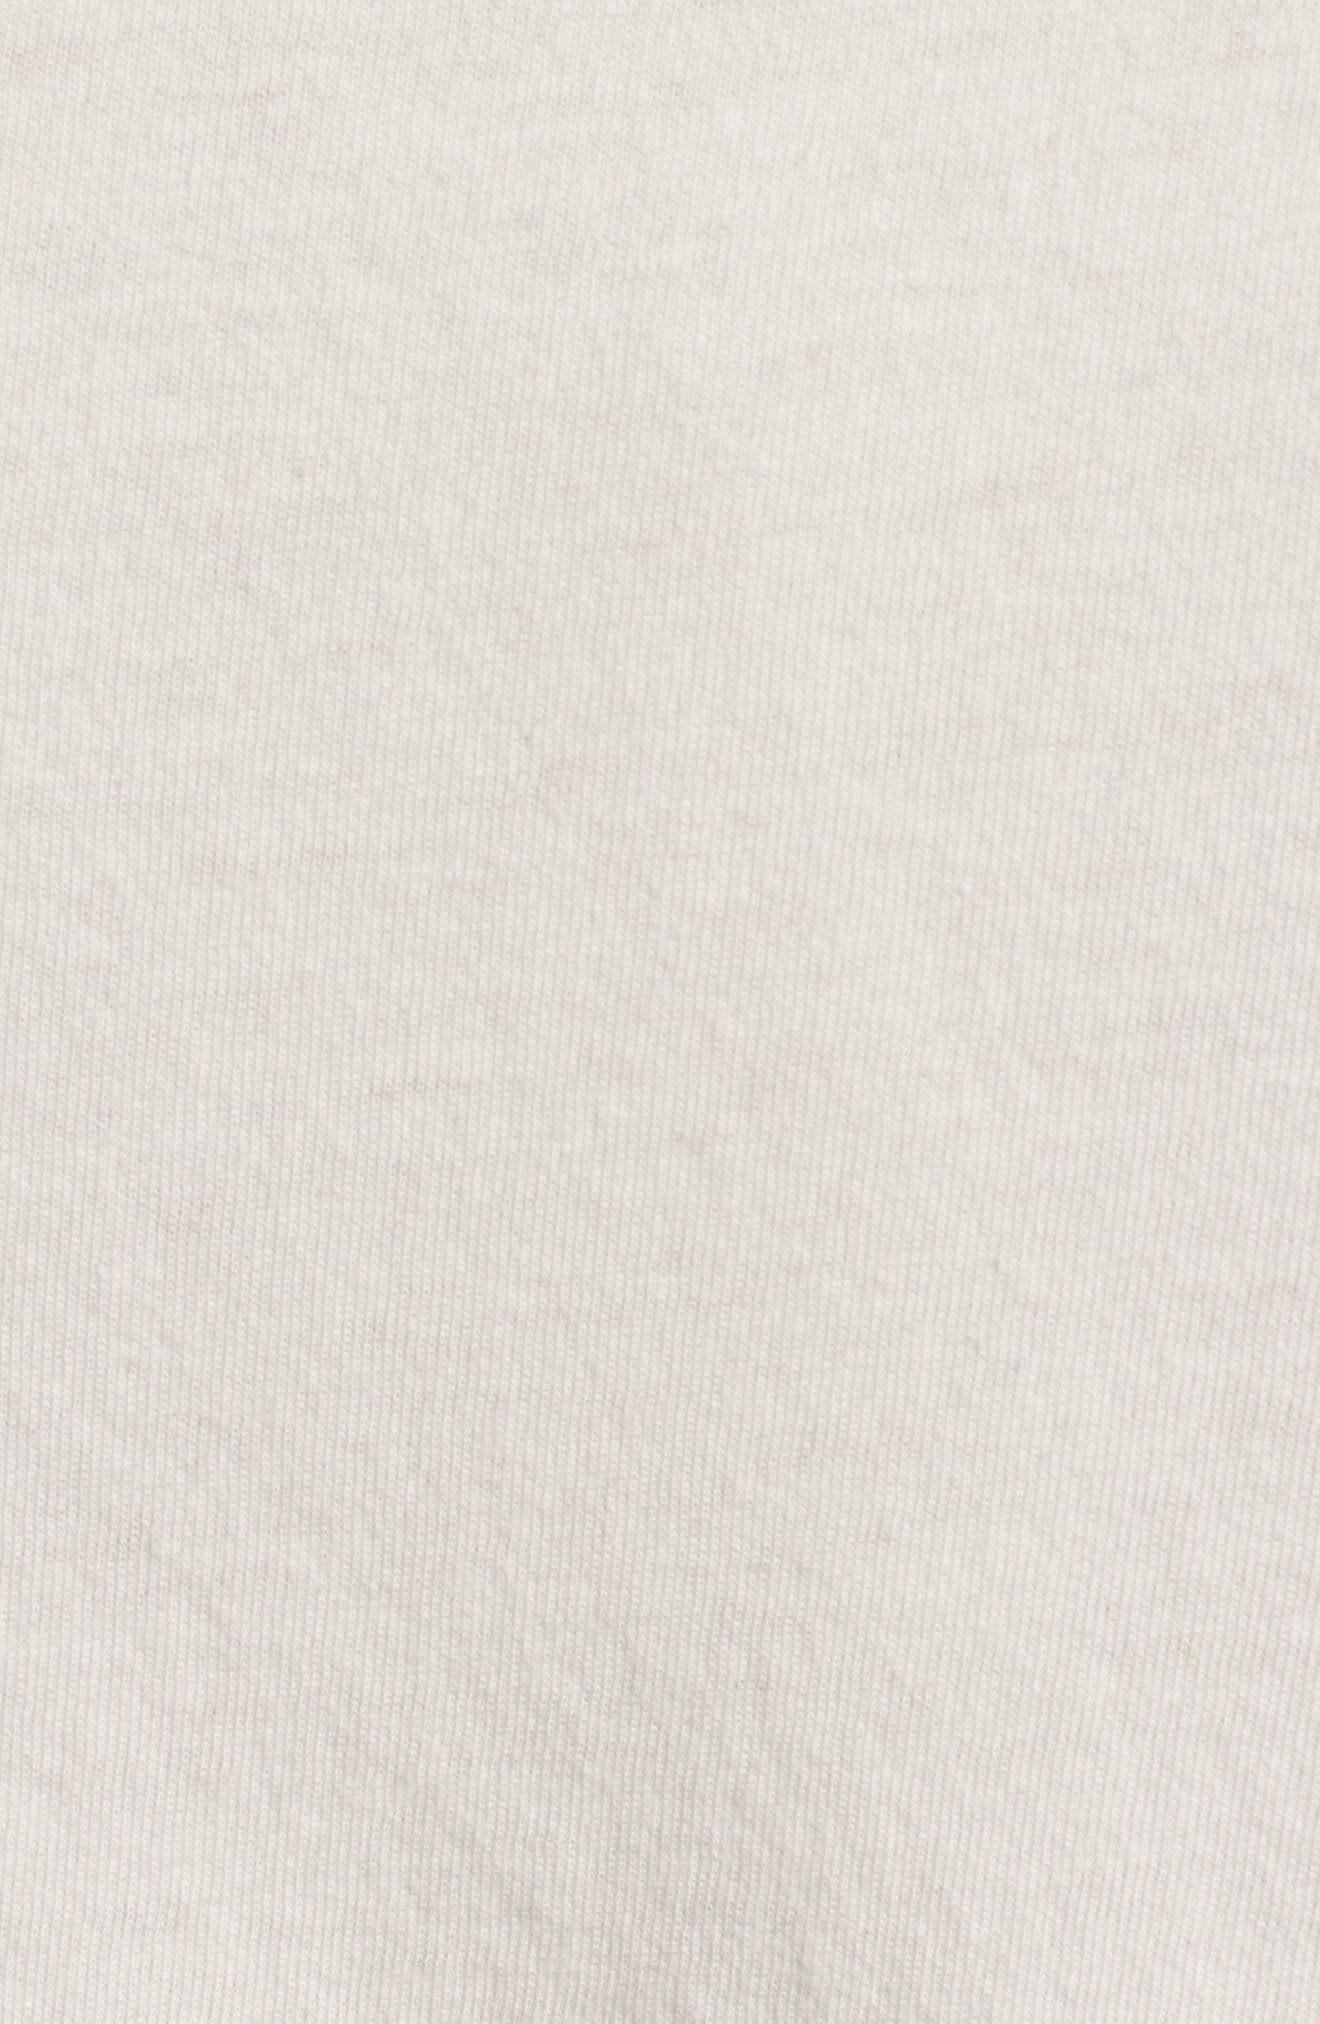 Pow Pow Crew Graphic T-Shirt,                             Alternate thumbnail 5, color,                             Dirty White